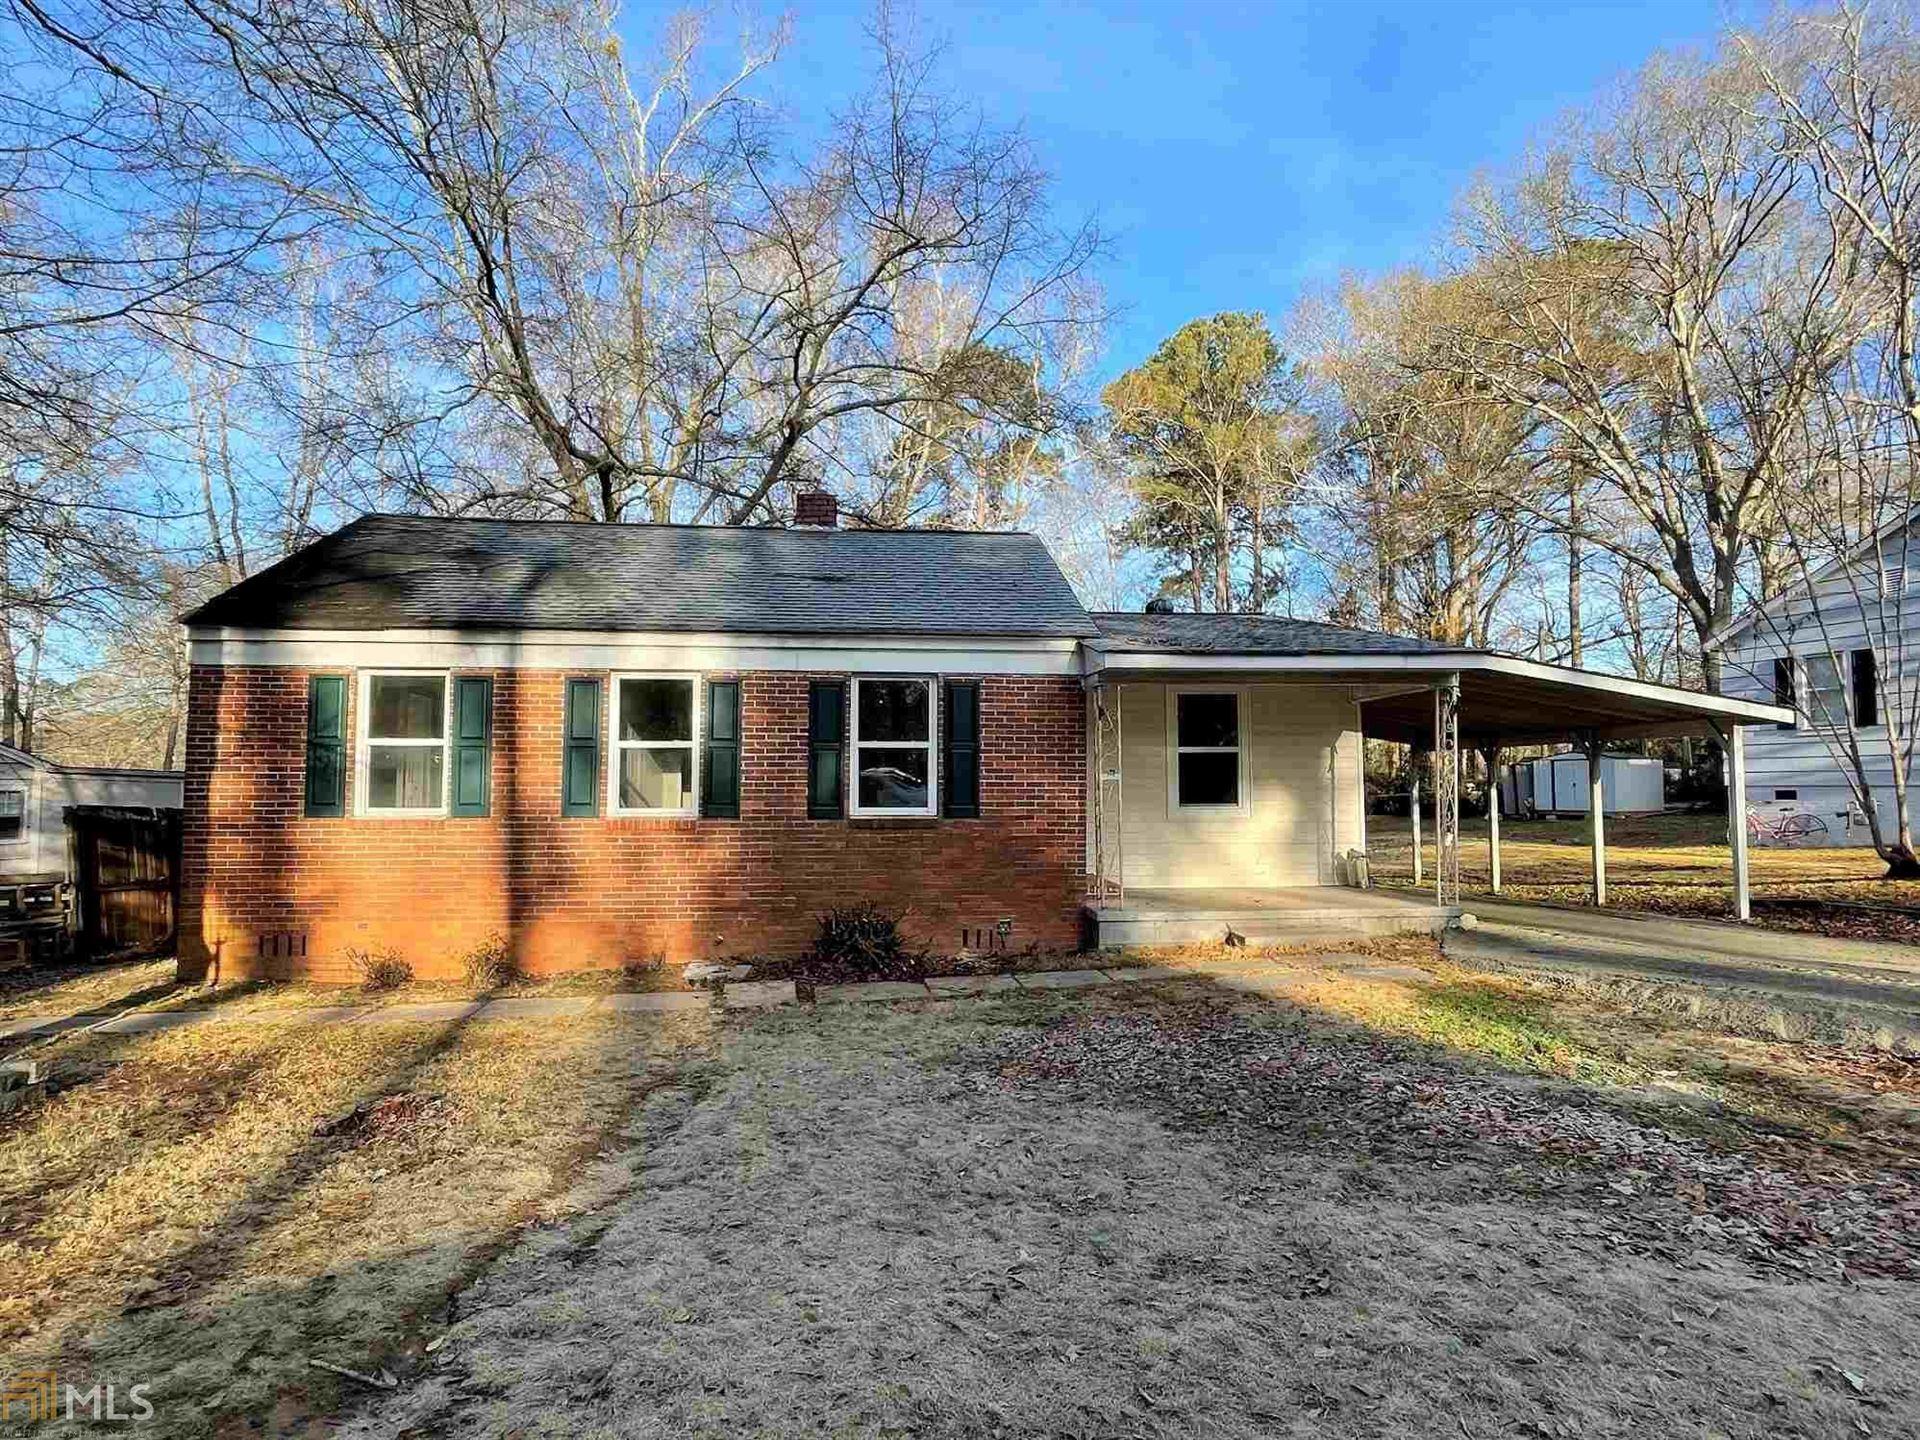 128 Oak Dr, Elberton, GA 30635 - MLS#: 8909061